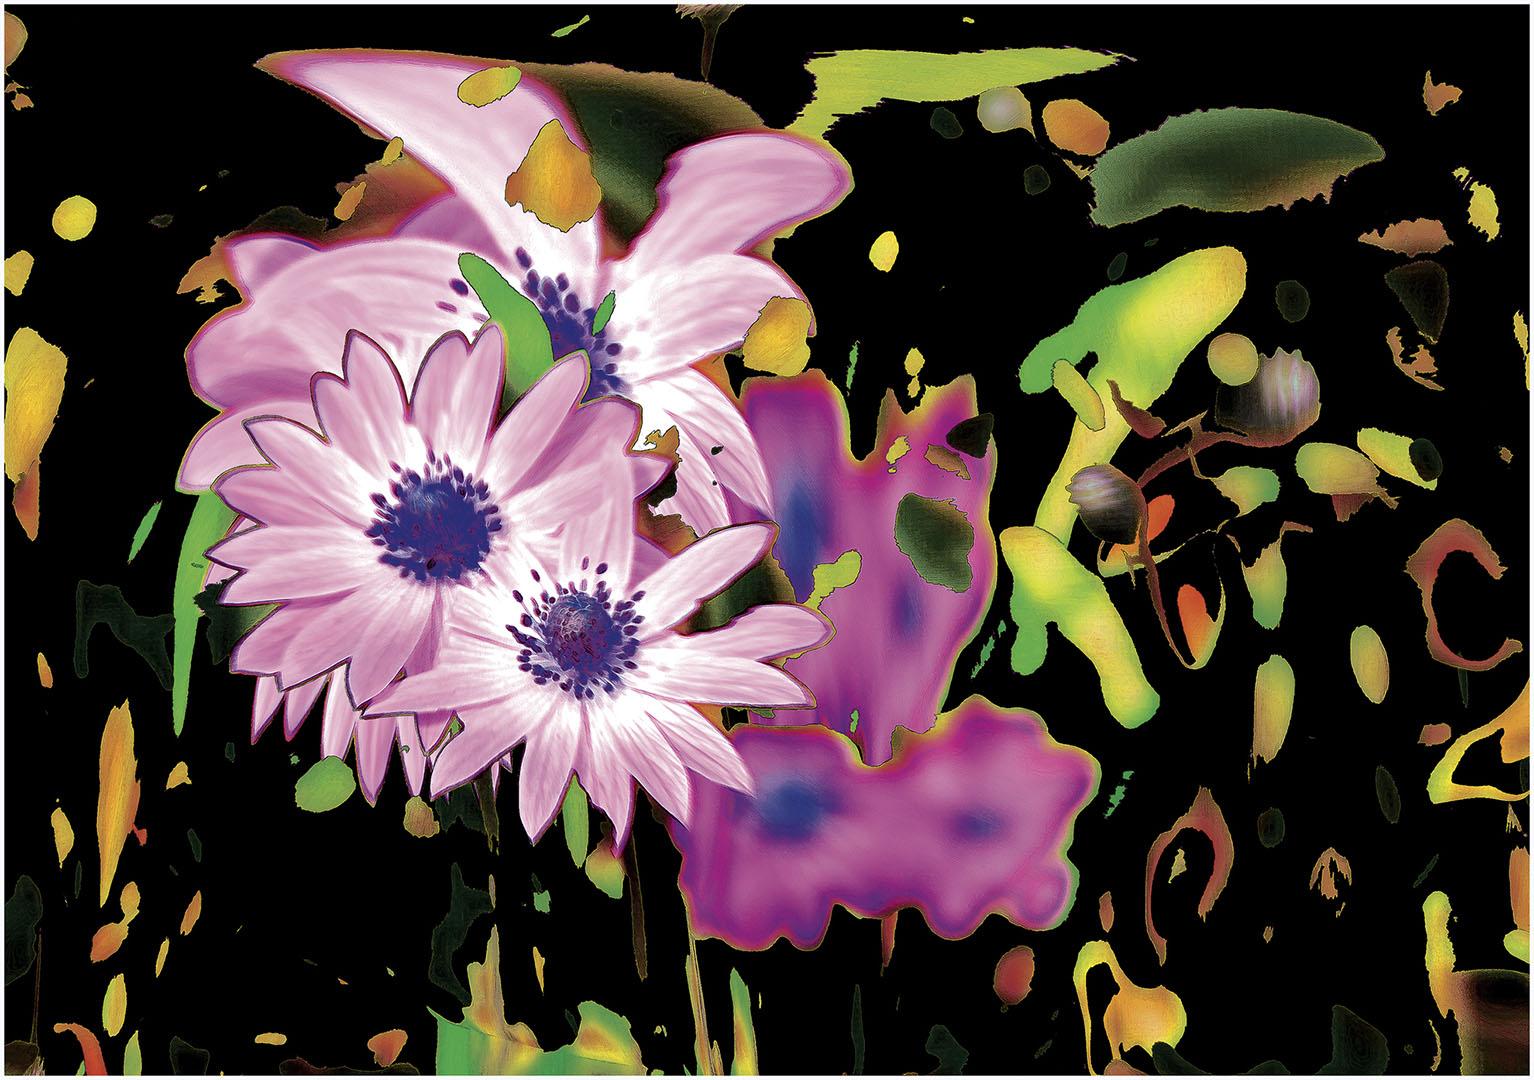 Flowers_159_I12.1-72